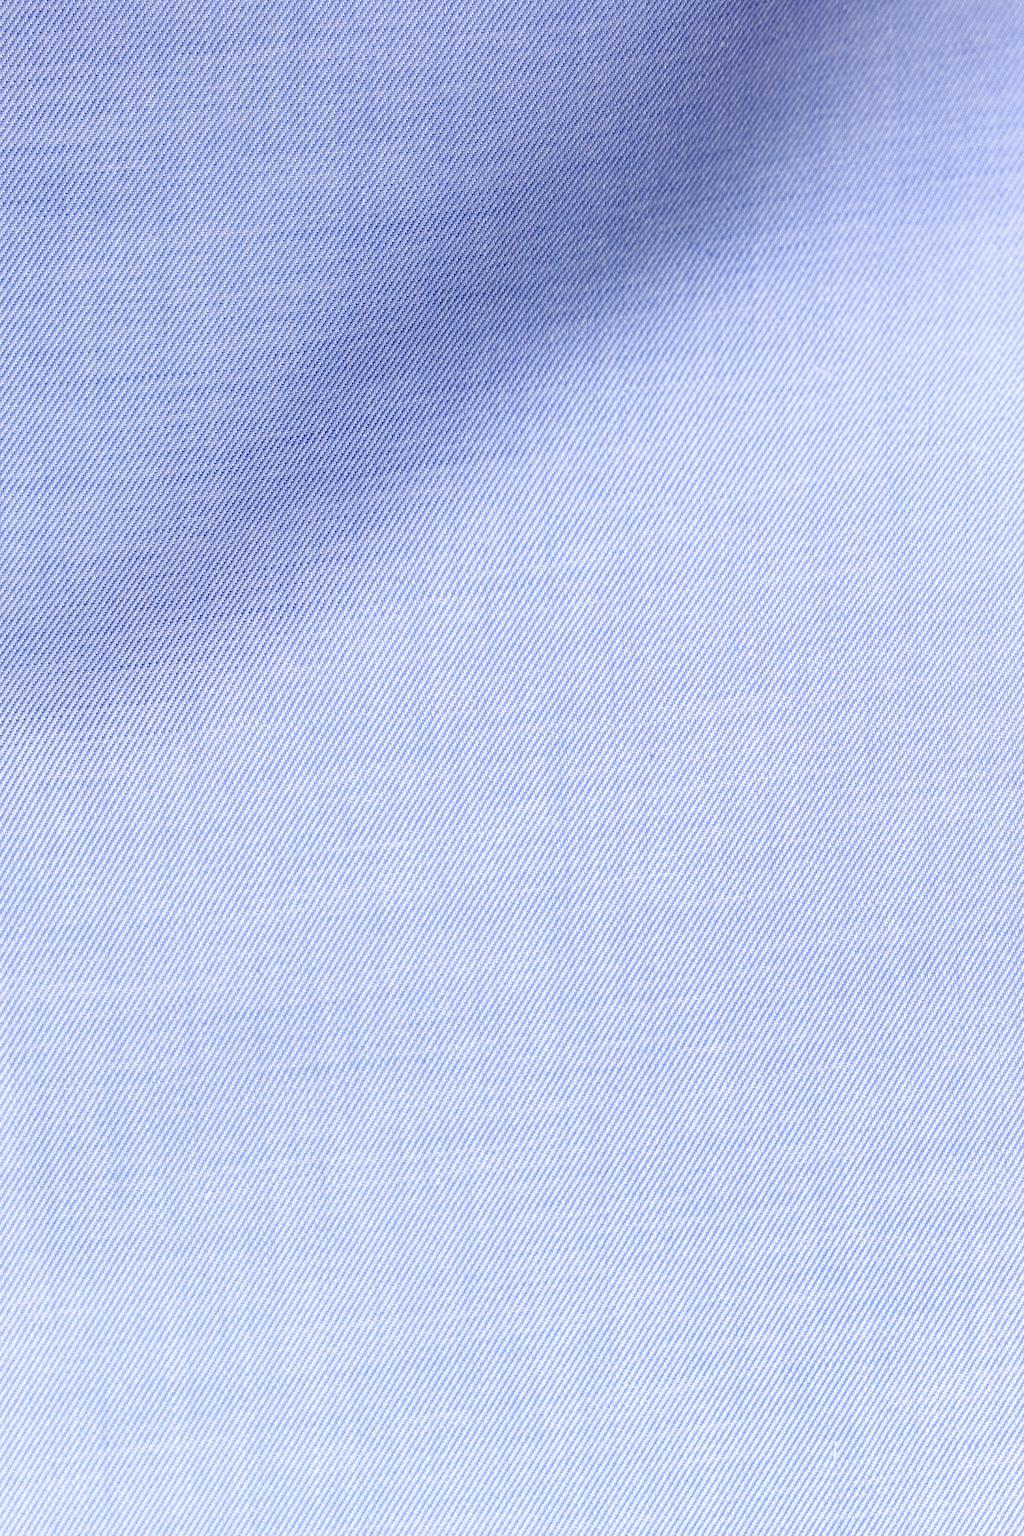 6710 Blue Textured Twill.JPG